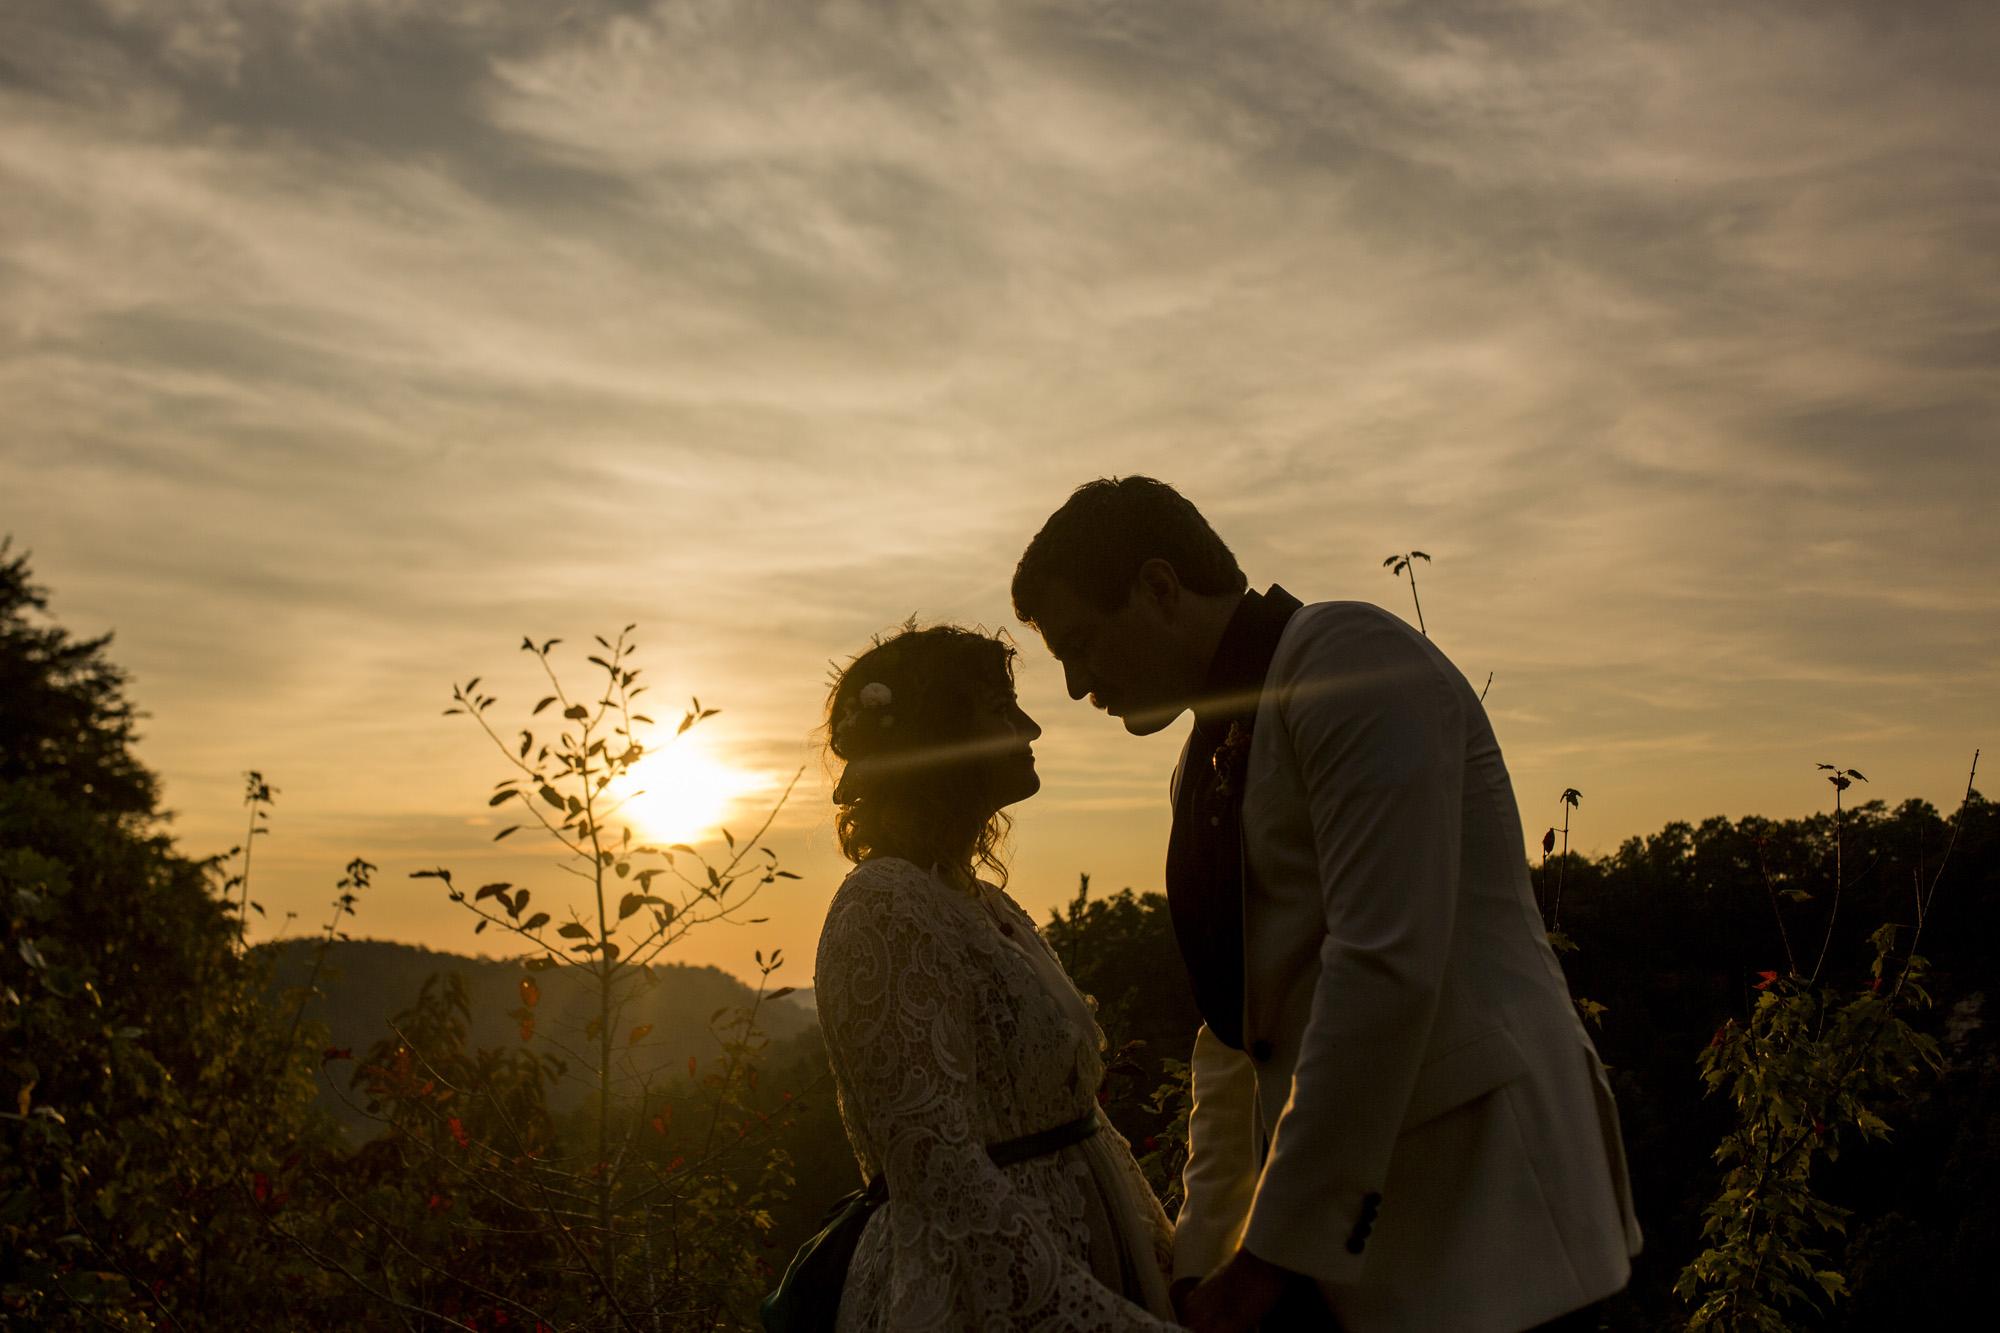 Seriously_Sabrina_Photography_Red_River_Gorge_Kentucky_Wedding_ShawnDana165.jpg